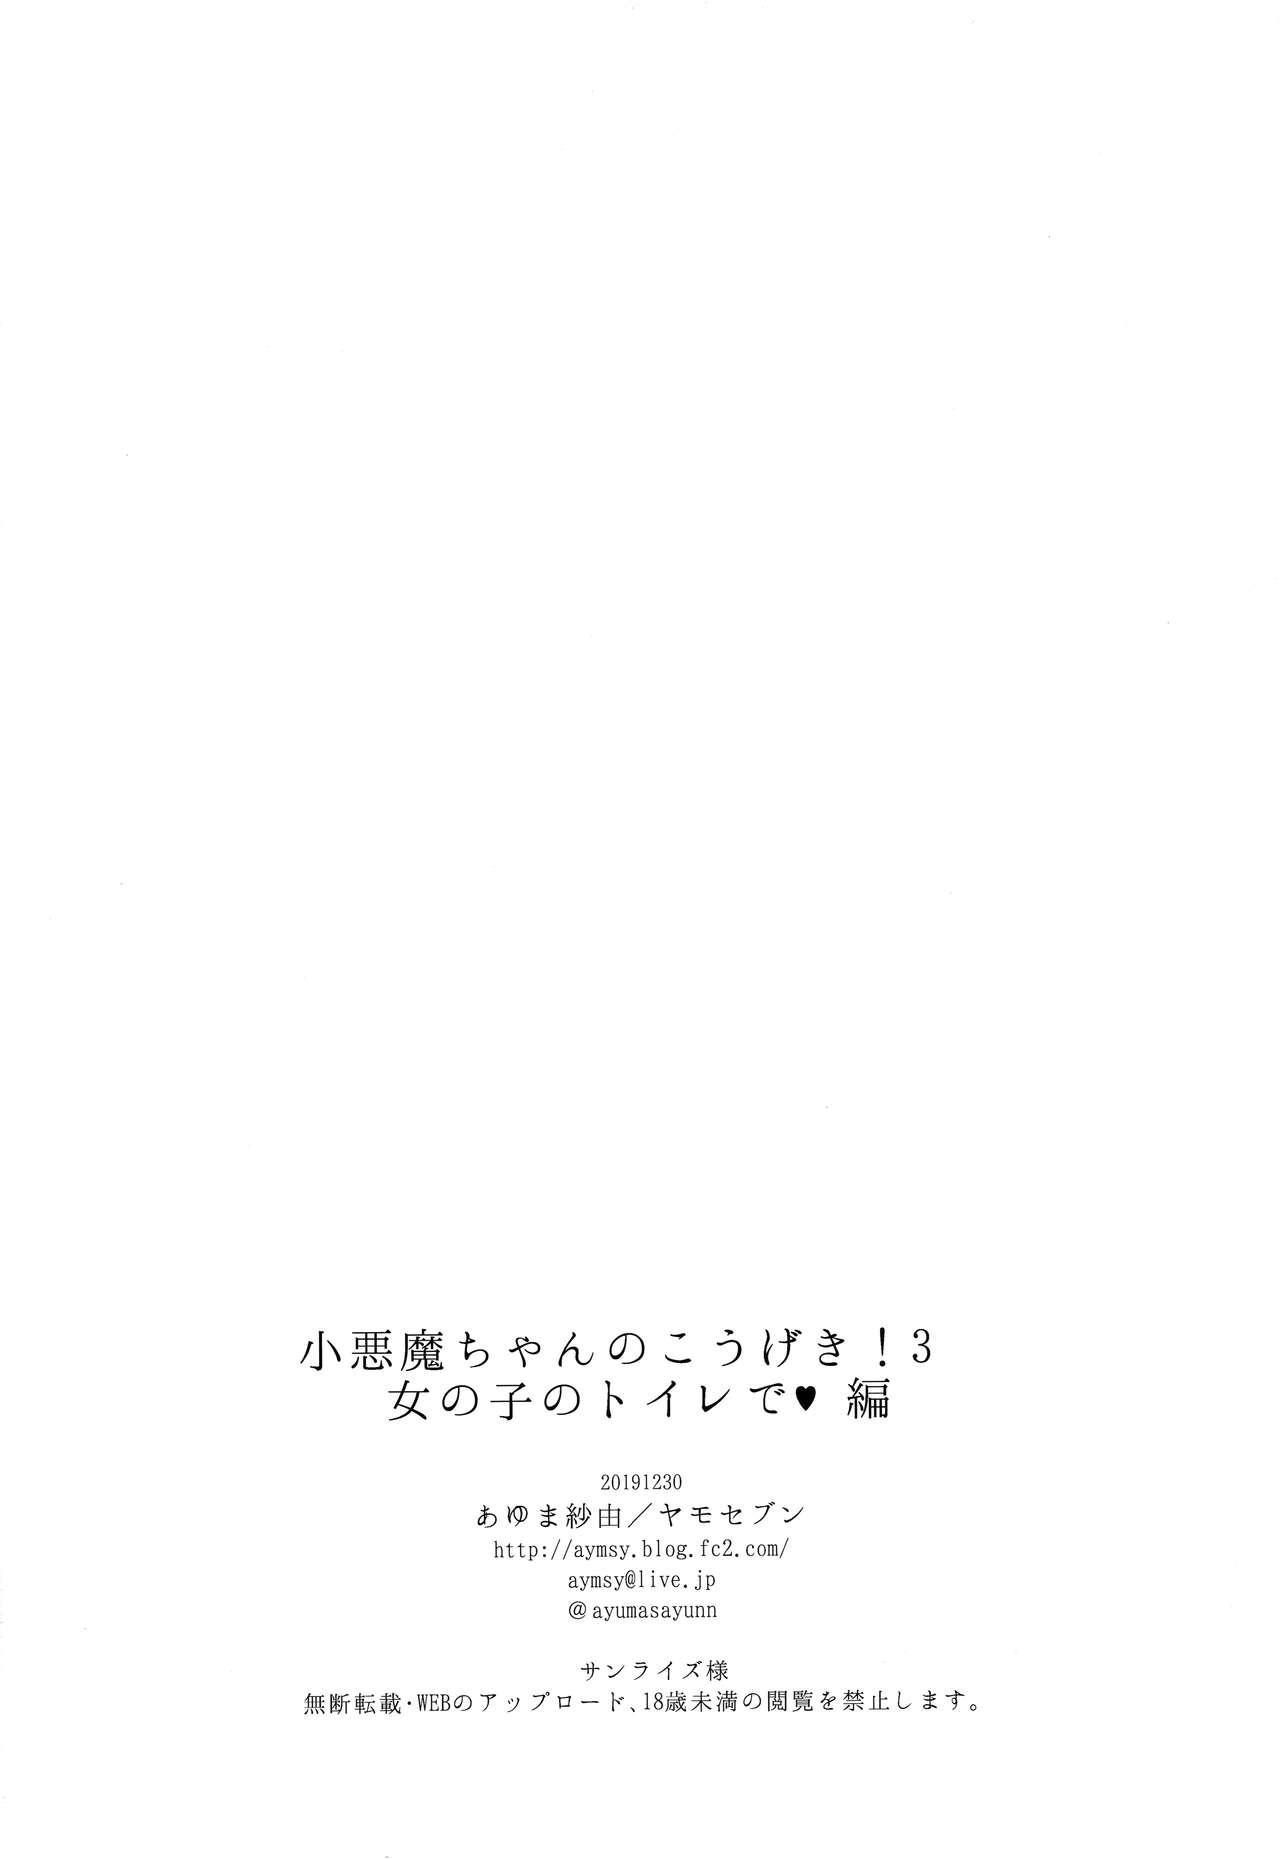 Koakuma-chan no Kougeki! 3 Onnanoko no toilet de Hen 24